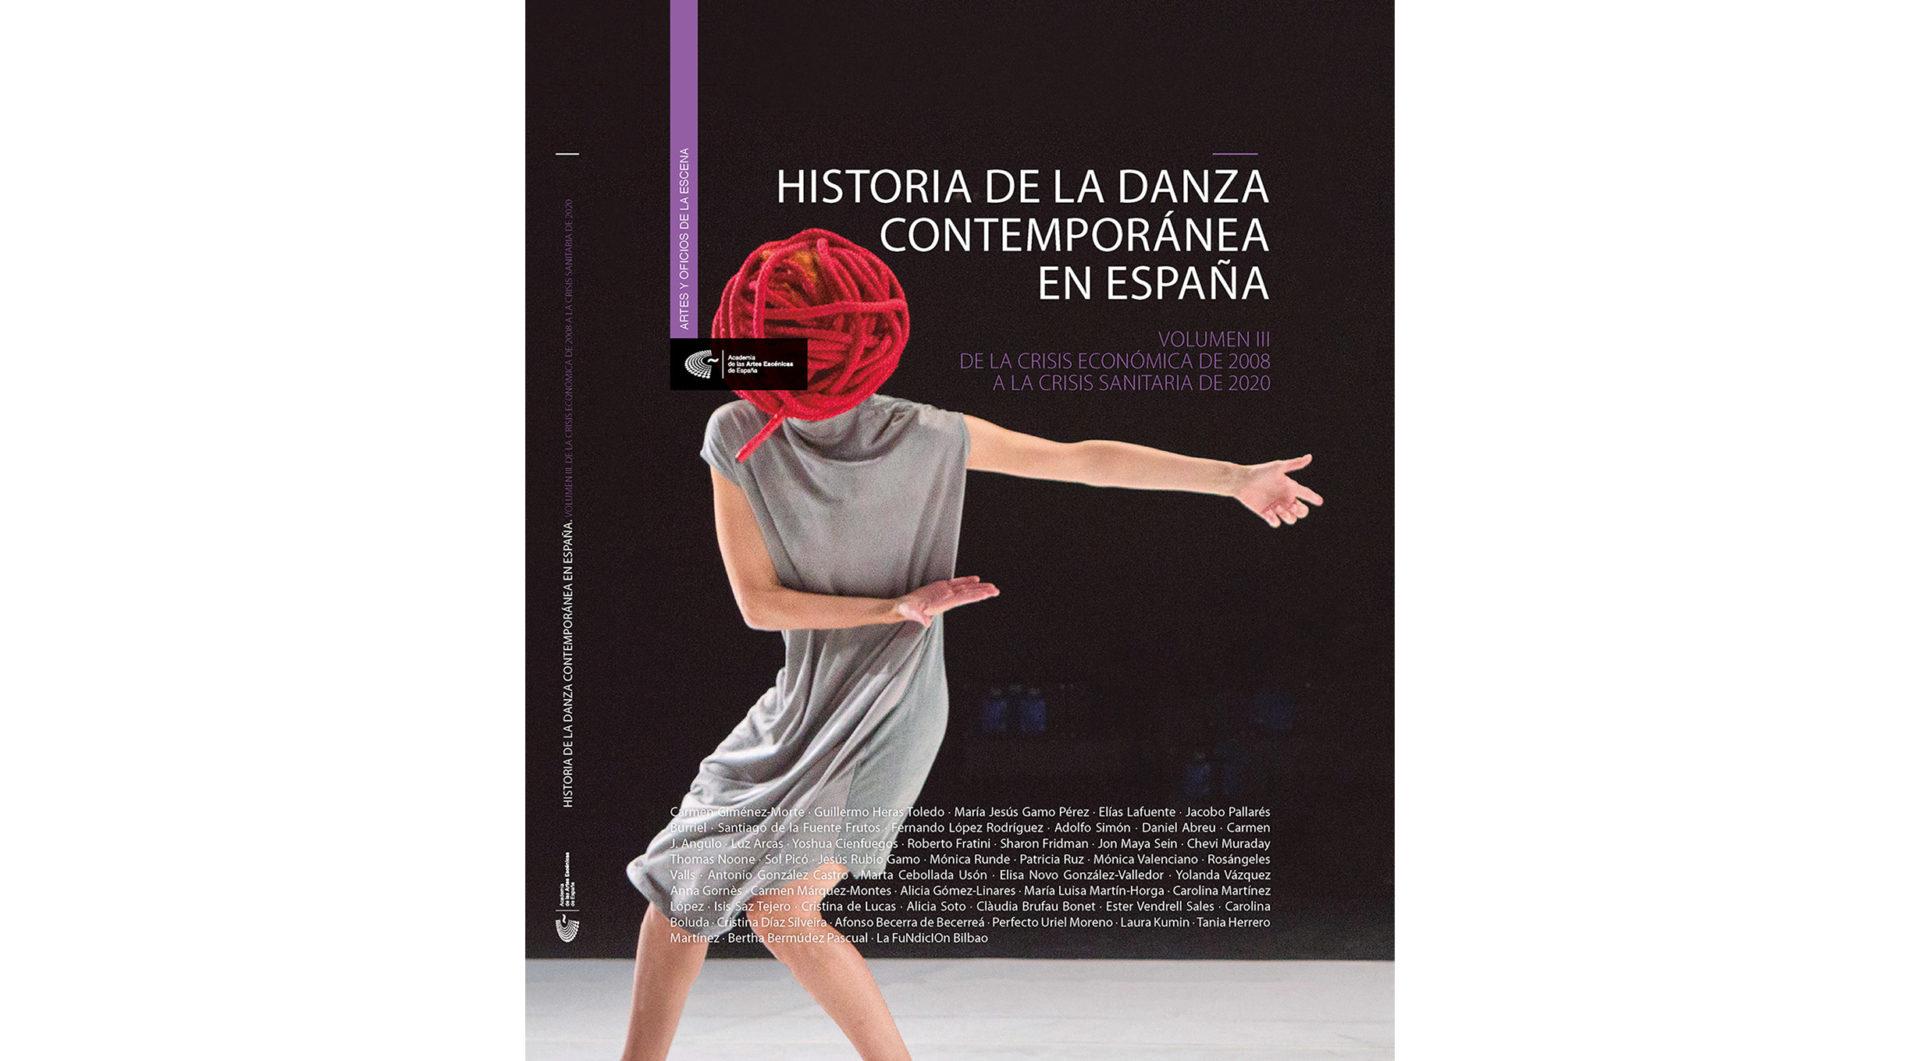 Presentació del llibre 'Historia de la danza contemporánea en España'